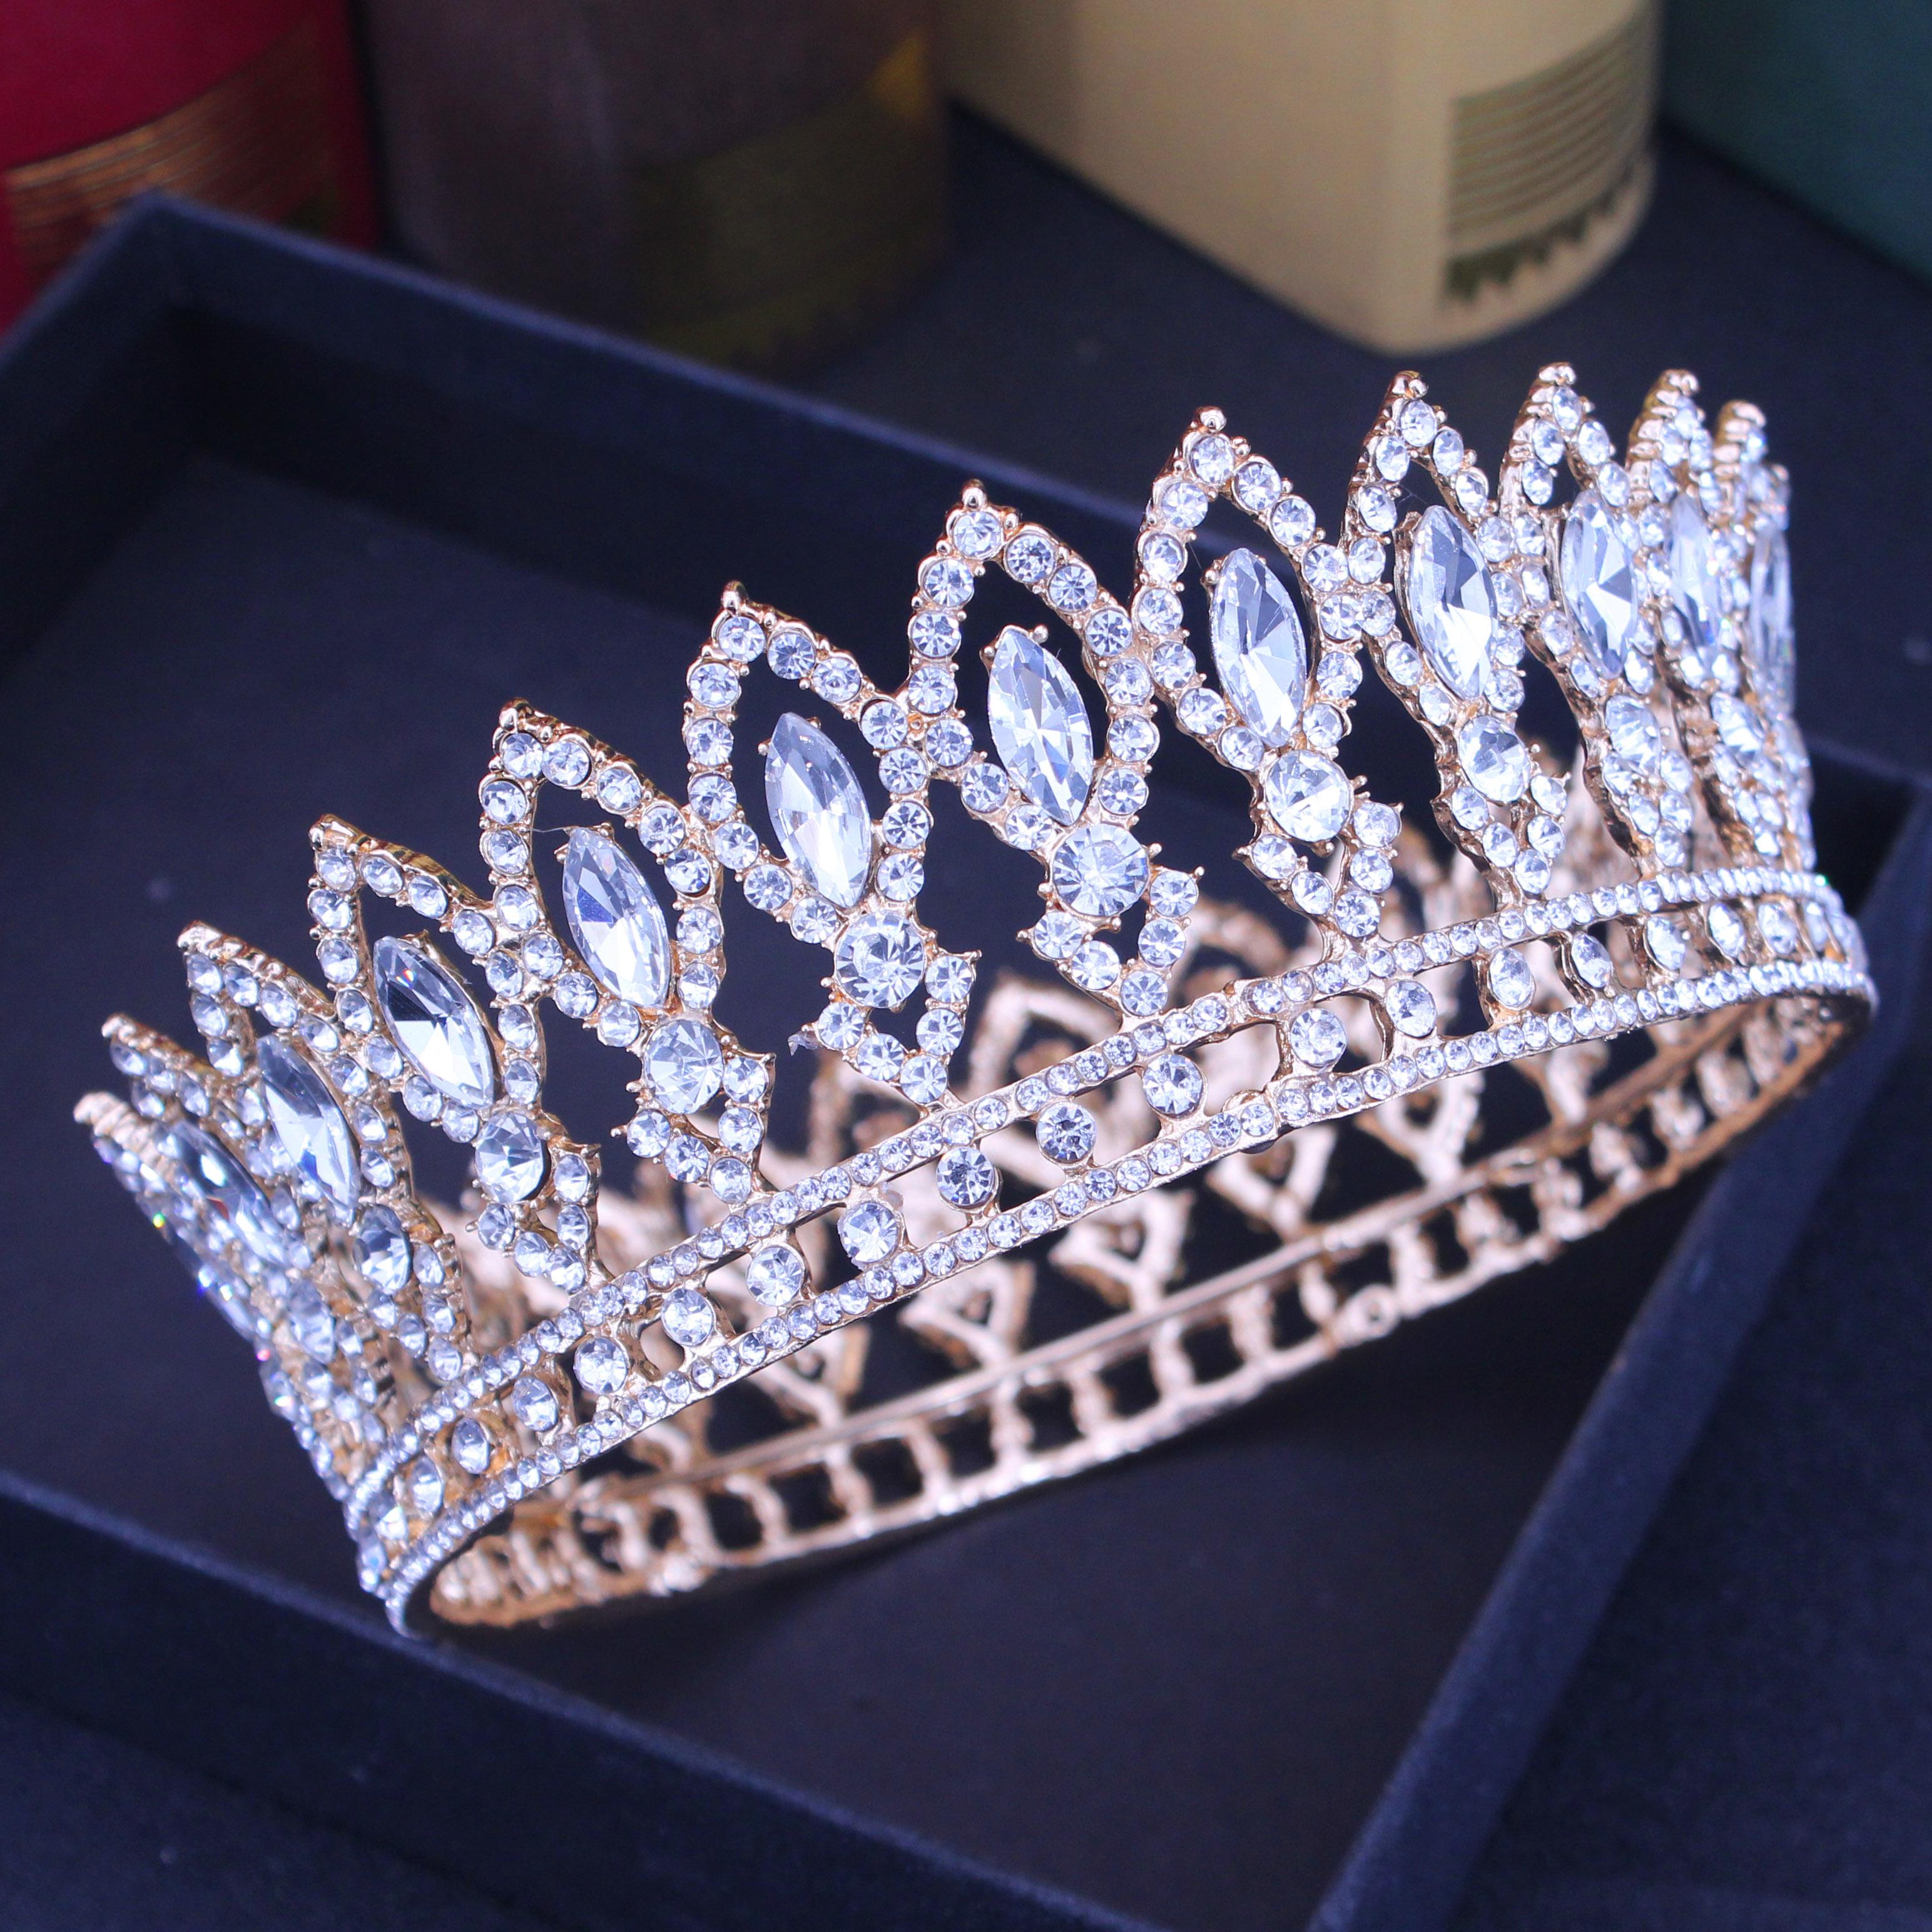 Tiara de cristal de Reina nupcial, coronas para boda, diadema de novia barroca dorada, diadema de concurso de belleza, accesorios de joyas para el pelo para mujer